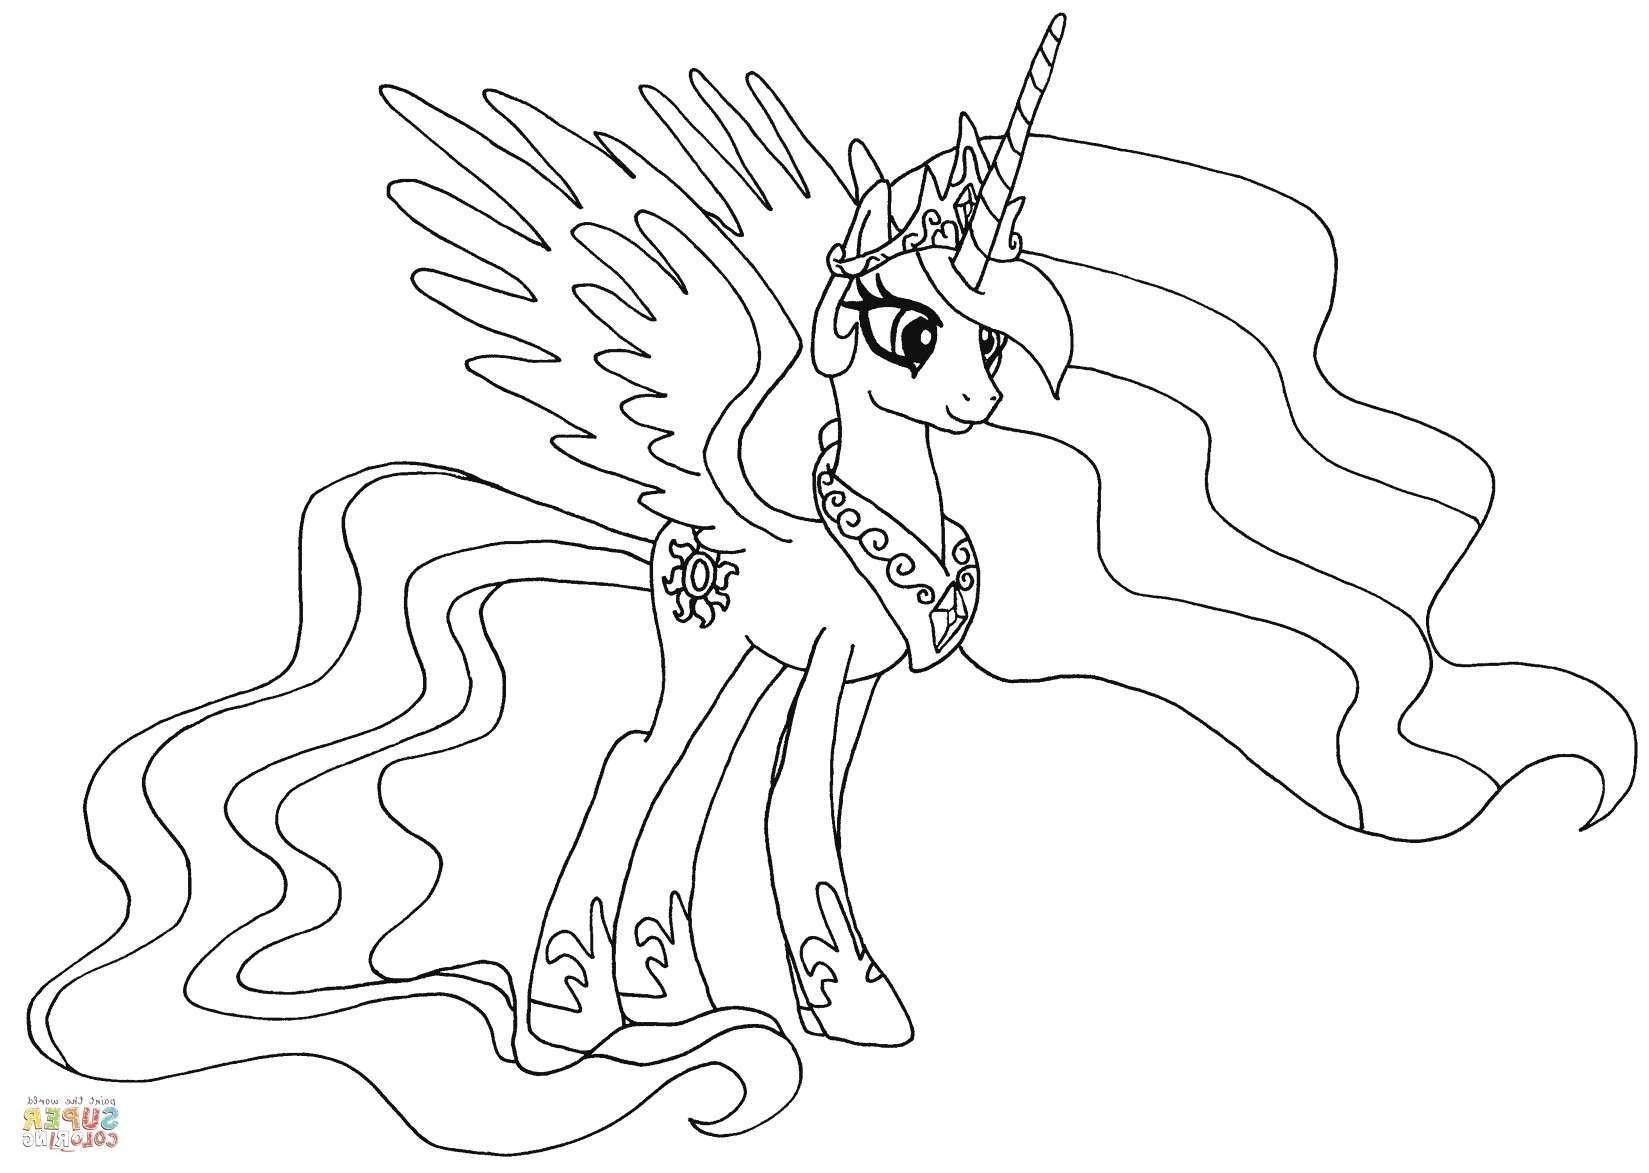 Ausmalbilder My Little Pony Equestria Girl Frisch 47 Neu Ausmalbilder My Little Pony Luna Beste Malvorlage Galerie